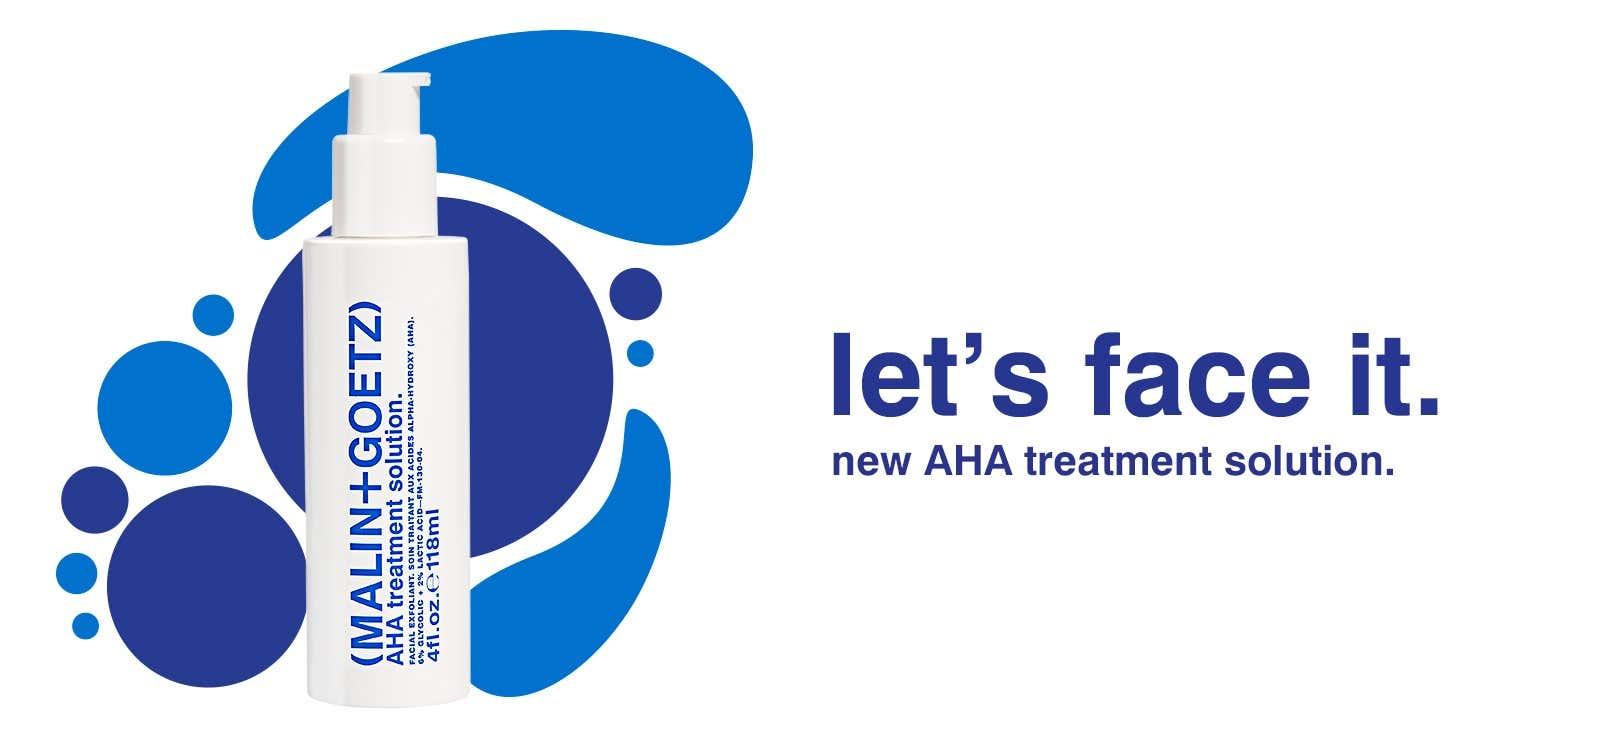 AHA Treatment Solution